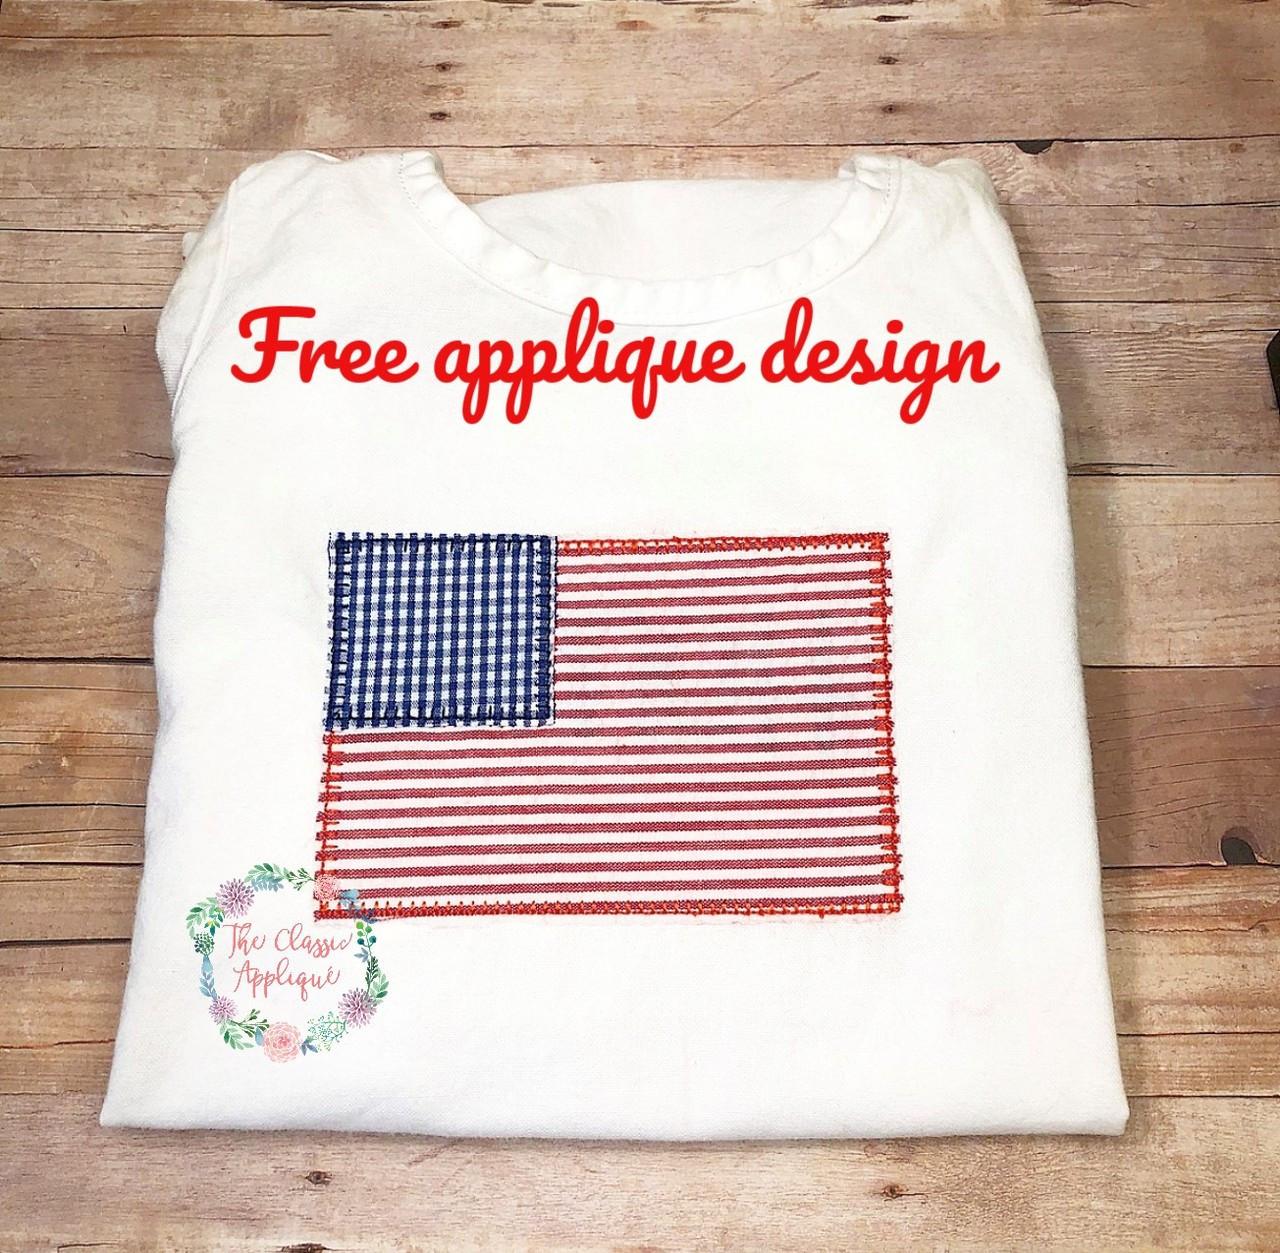 Free American Flag Blanket Stitch Vintage Style Vintage Stitch